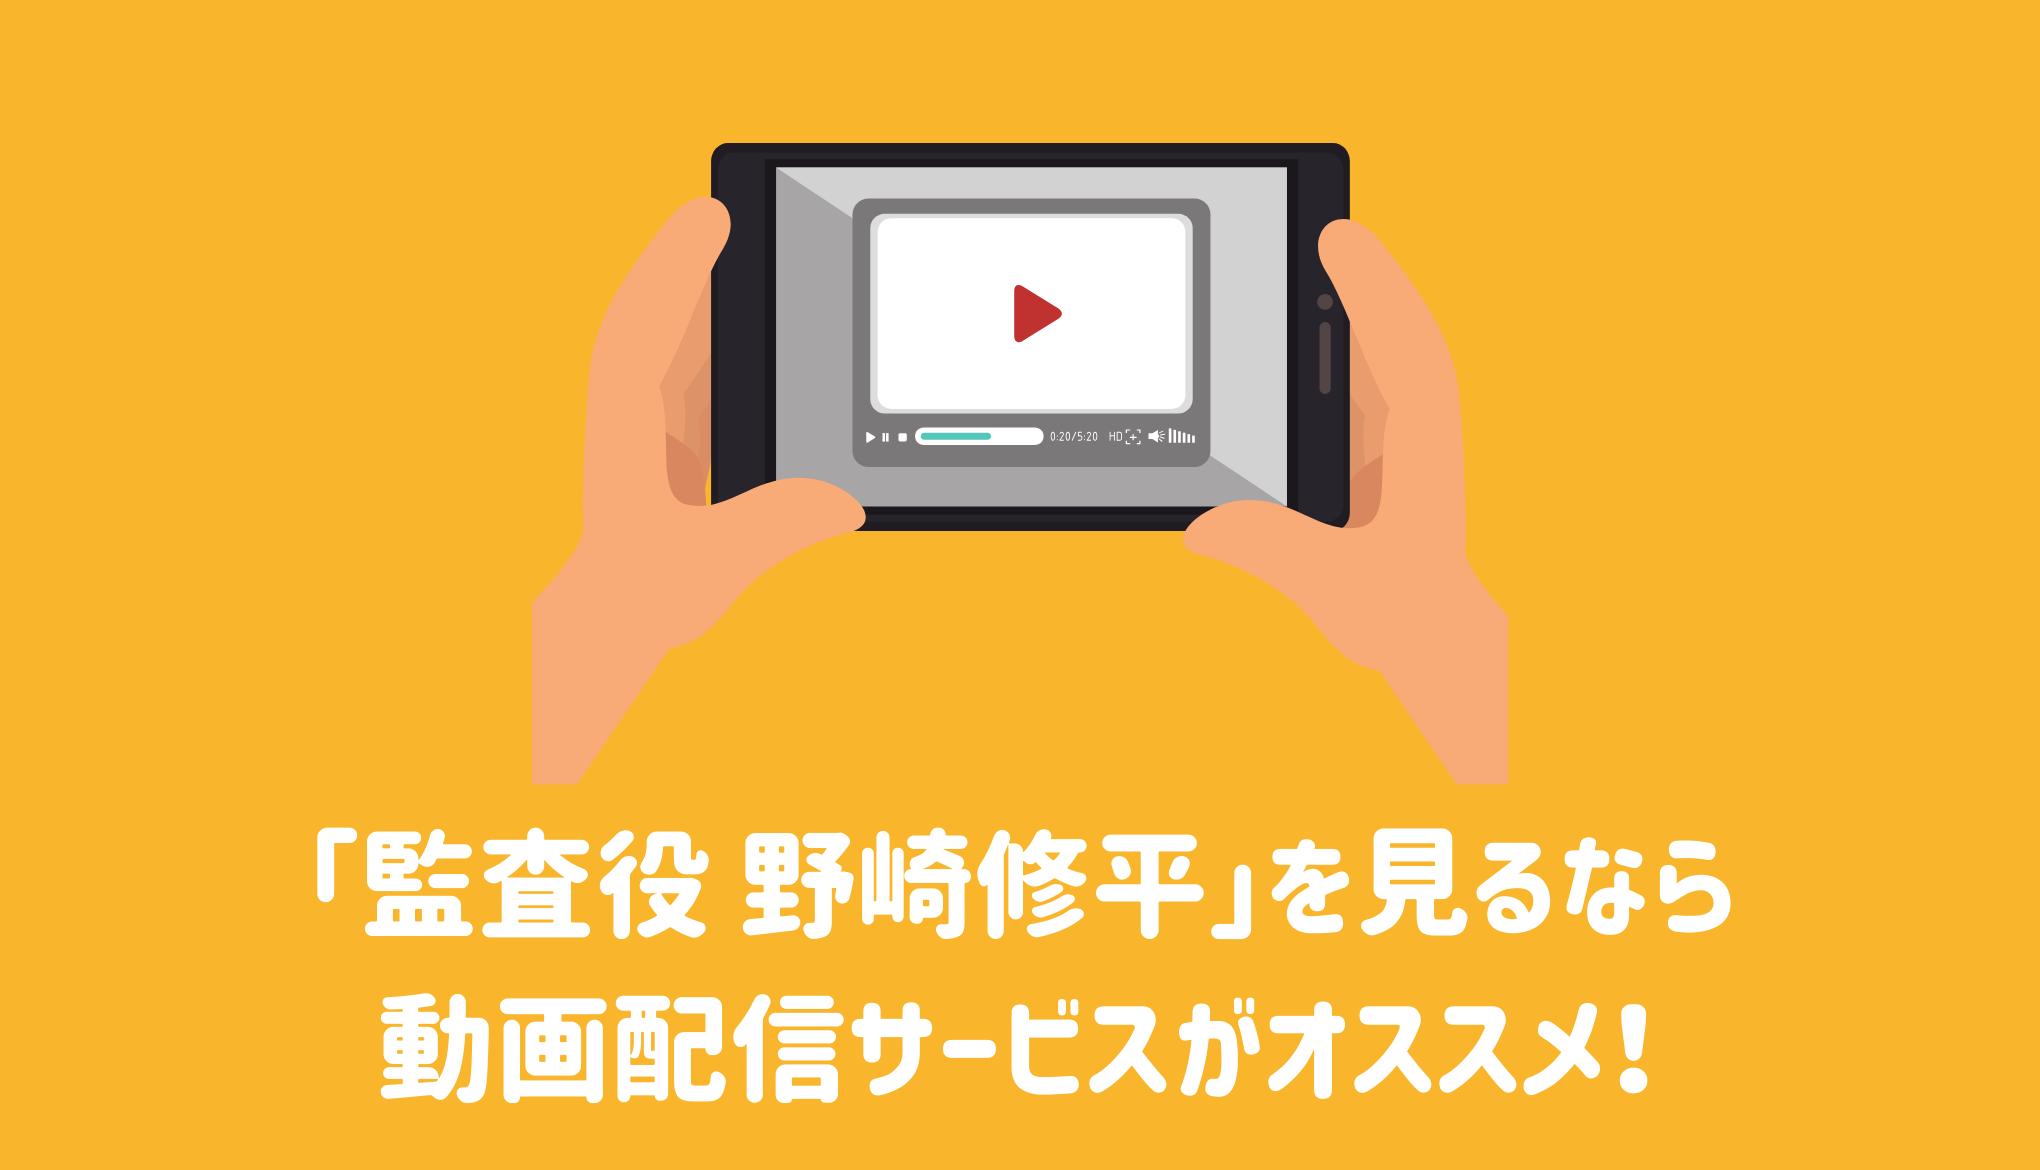 WOWOWオリジナルドラマ「監査役 野崎修平」を見るなら動画配信サービスがオススメ